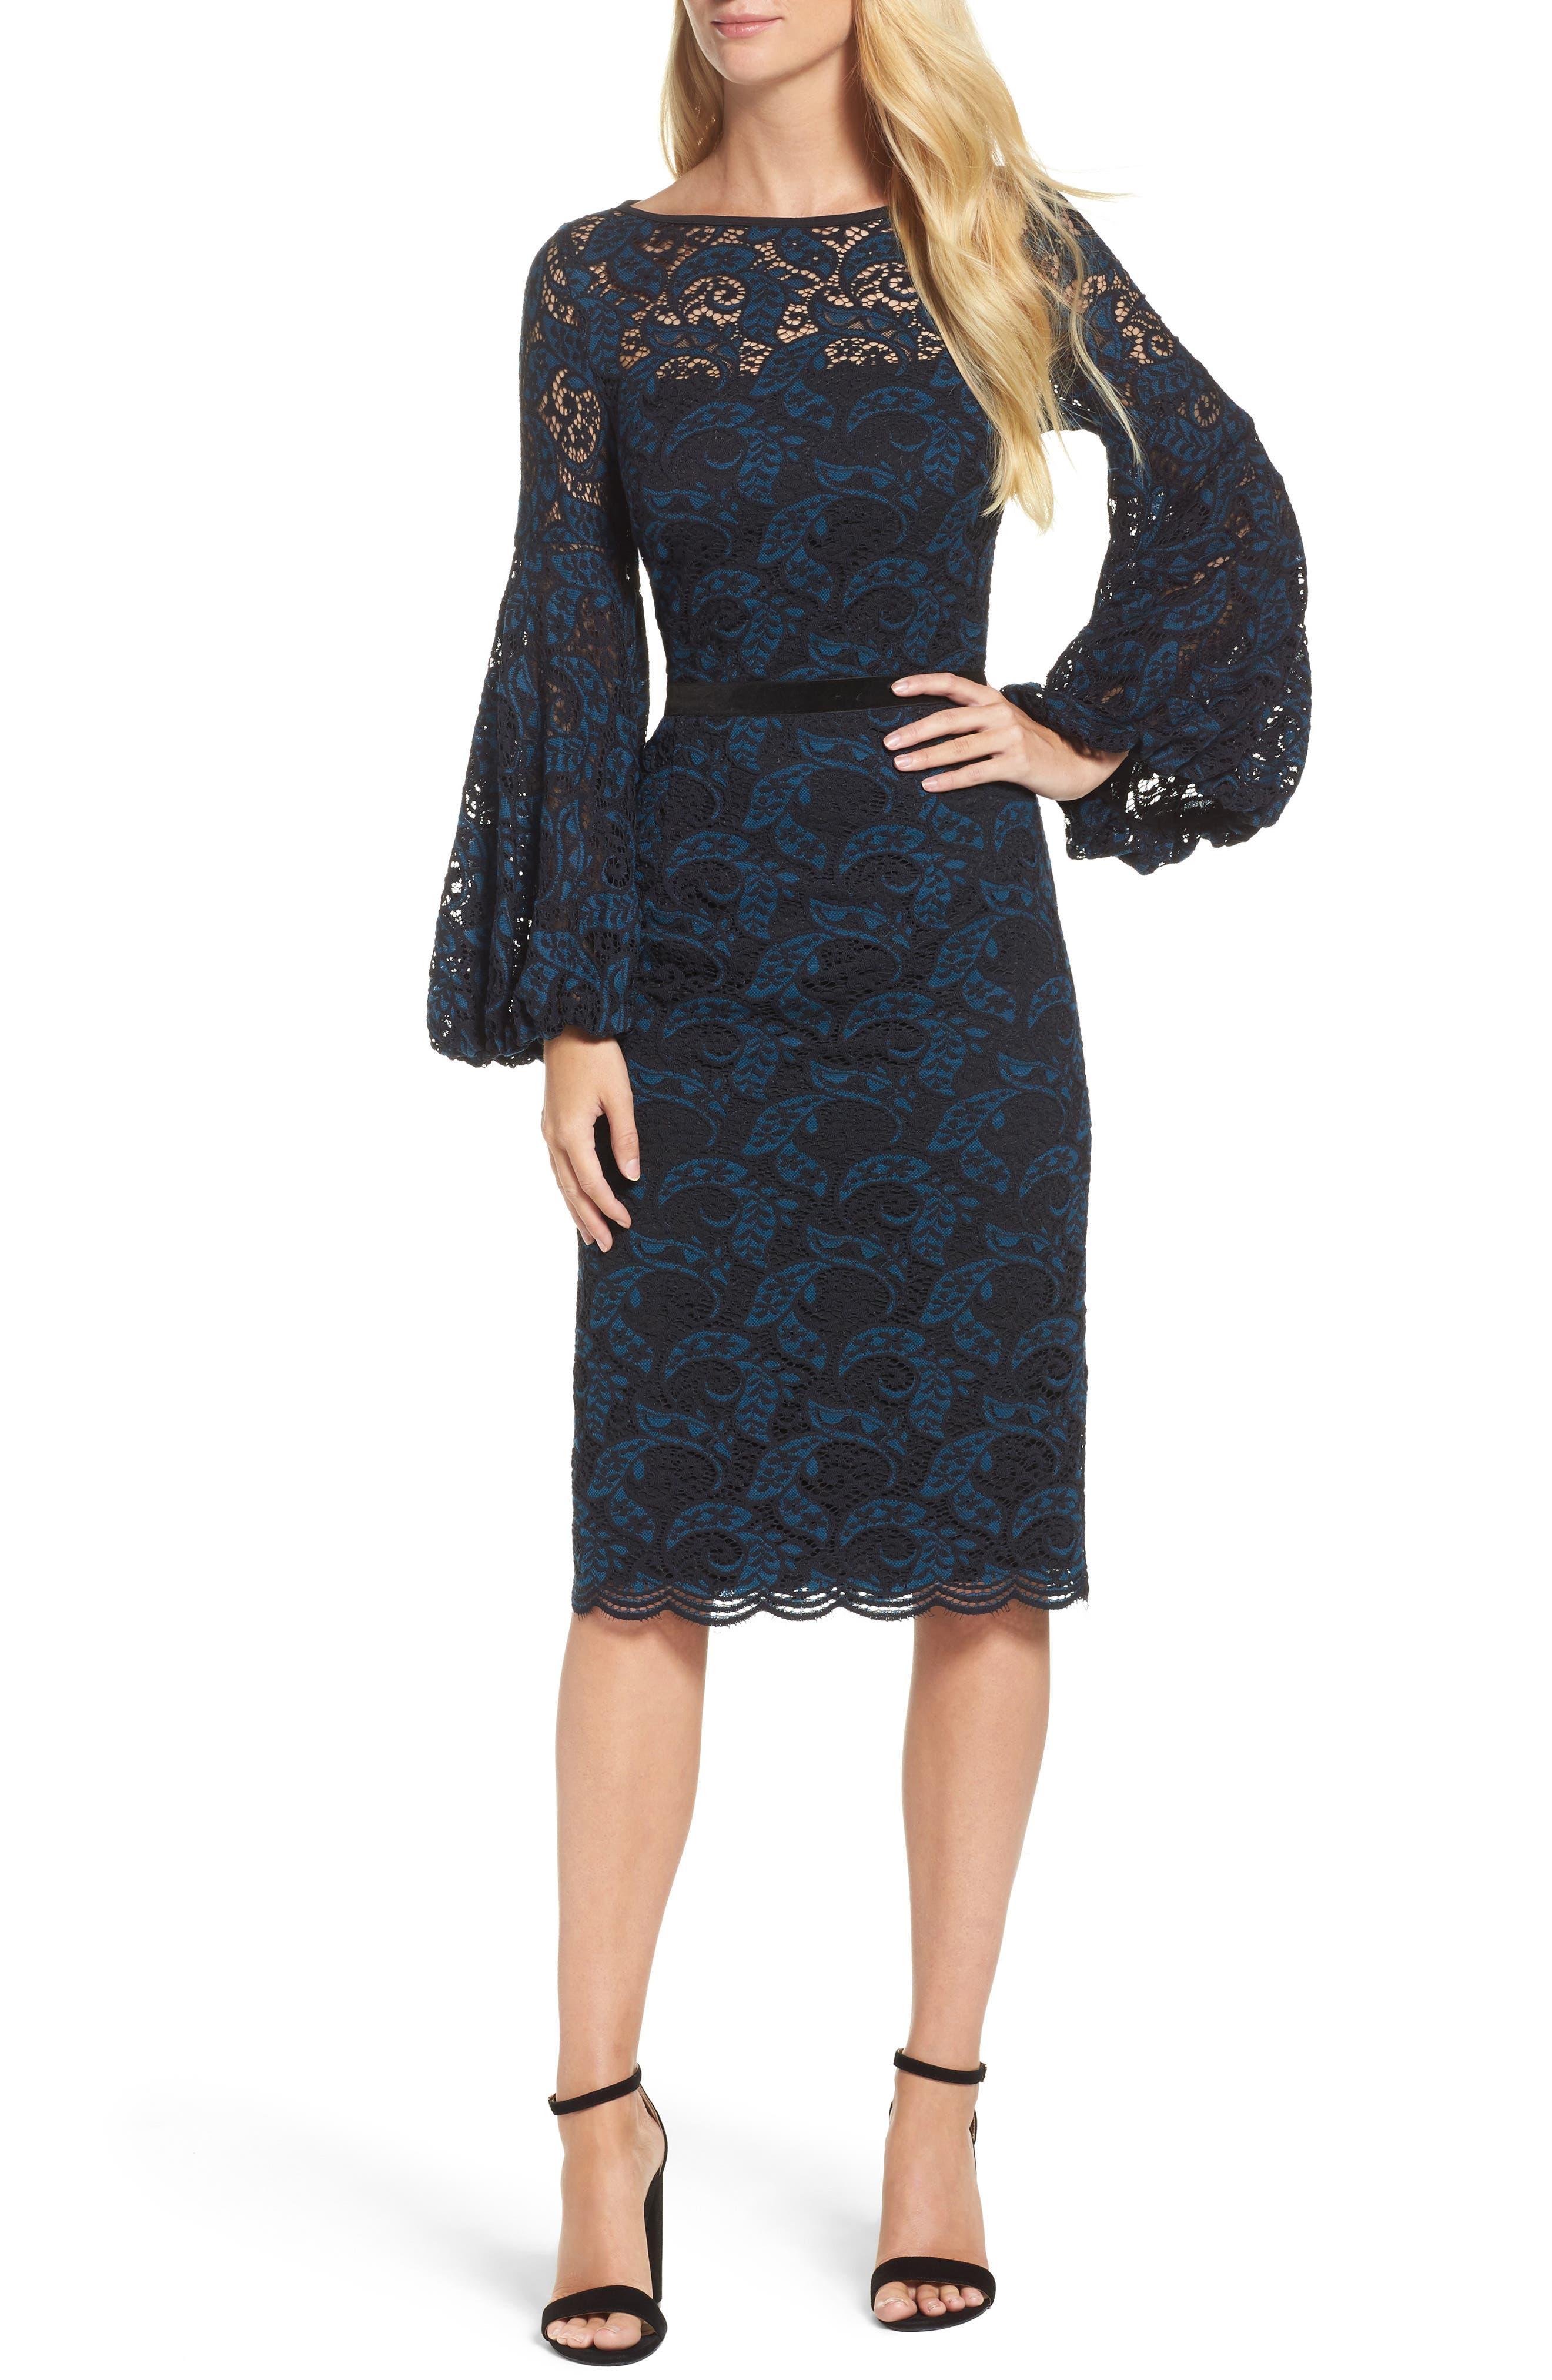 Lace Bishop Sleeve Dress,                             Main thumbnail 1, color,                             Blue/ Black